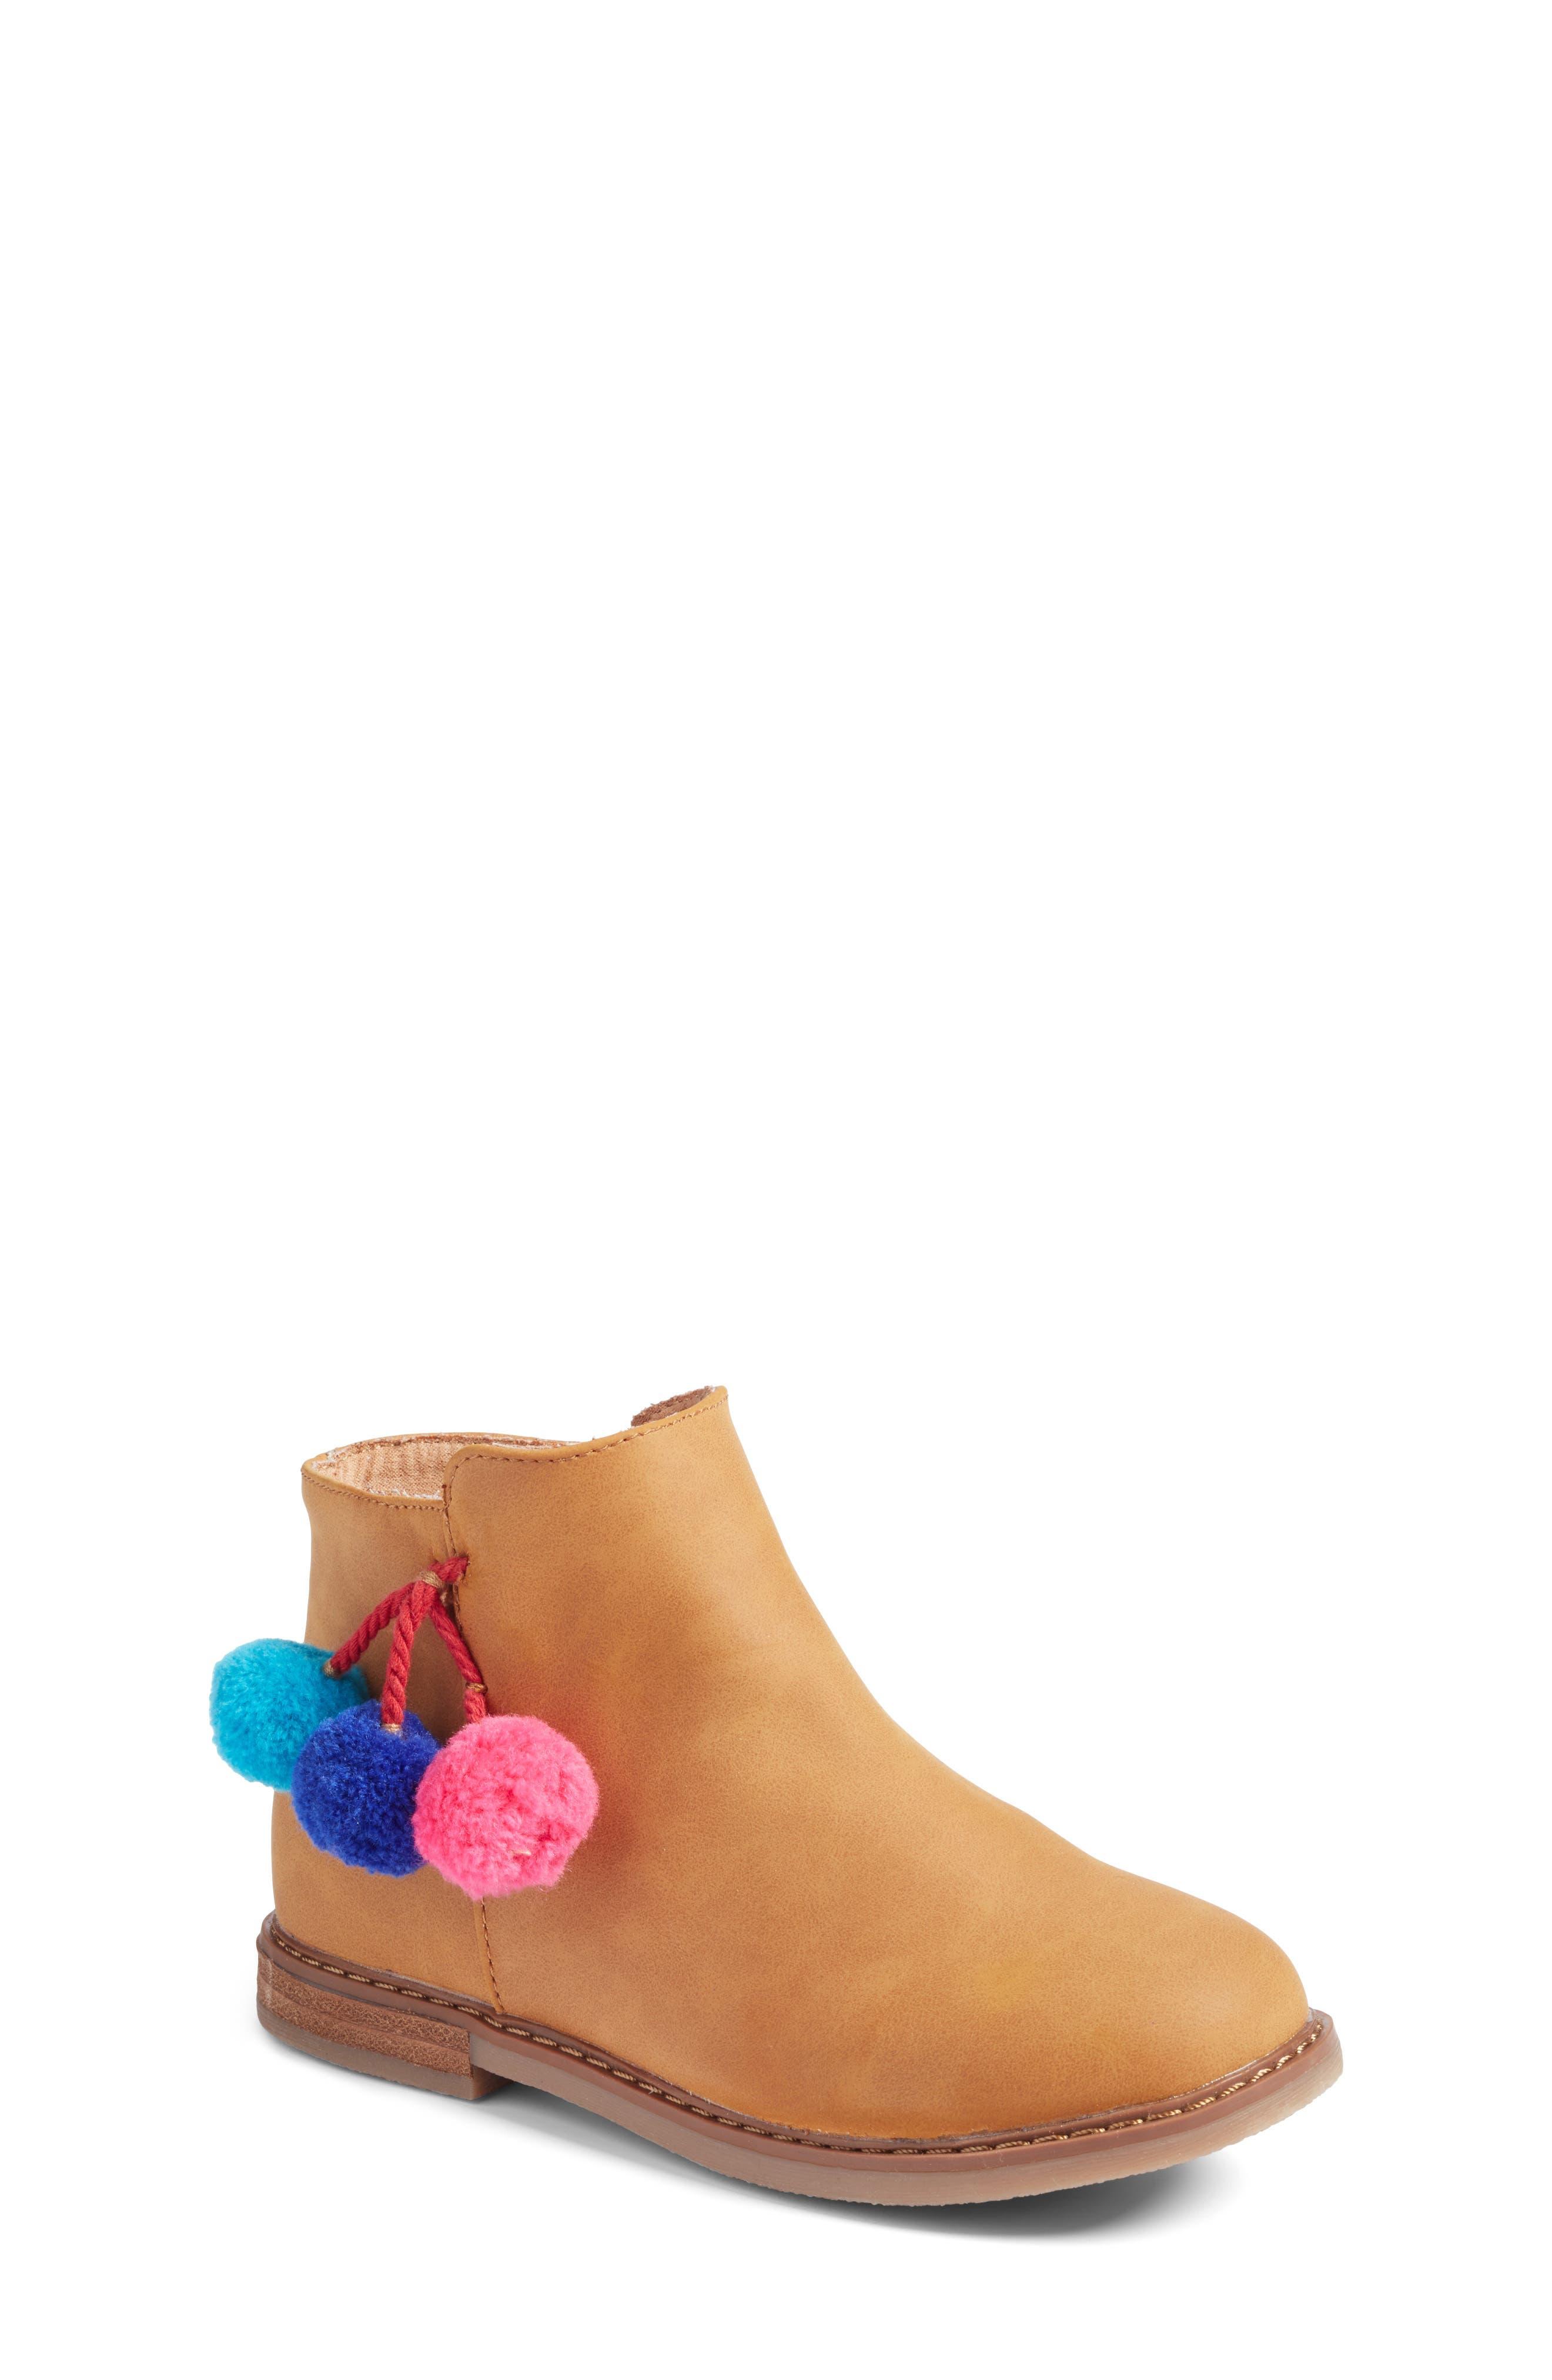 TUCKER + TATE Pom Boot